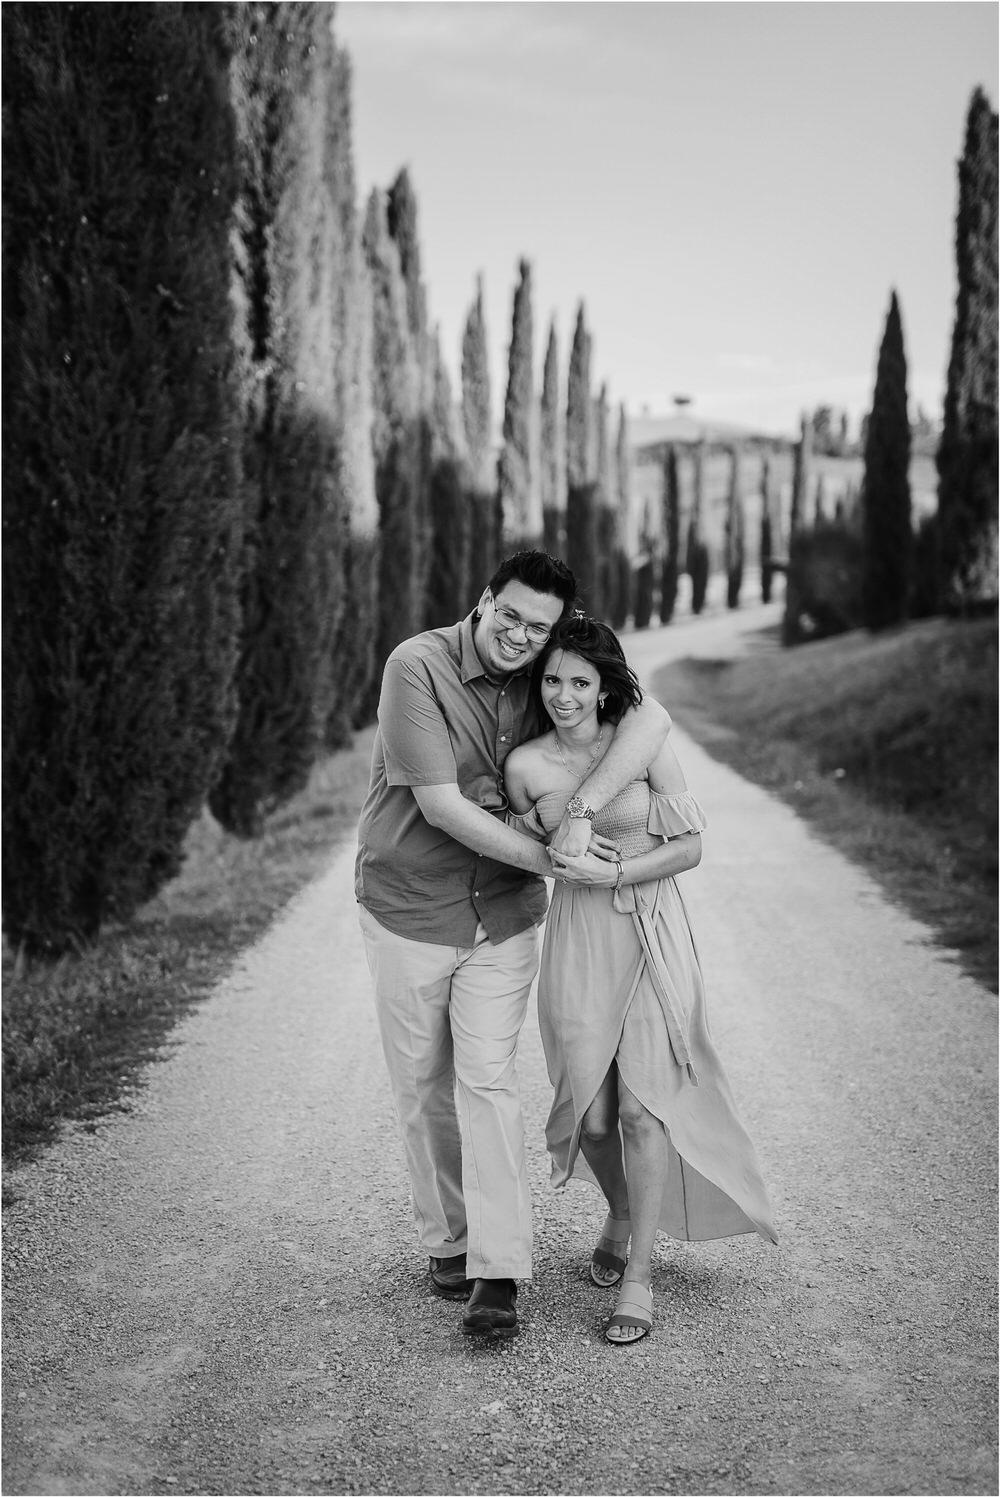 tuscany siena wedding anniversary honeymoon photography photographer italy matrimonio destination val d'orcia toscana 0050.jpg